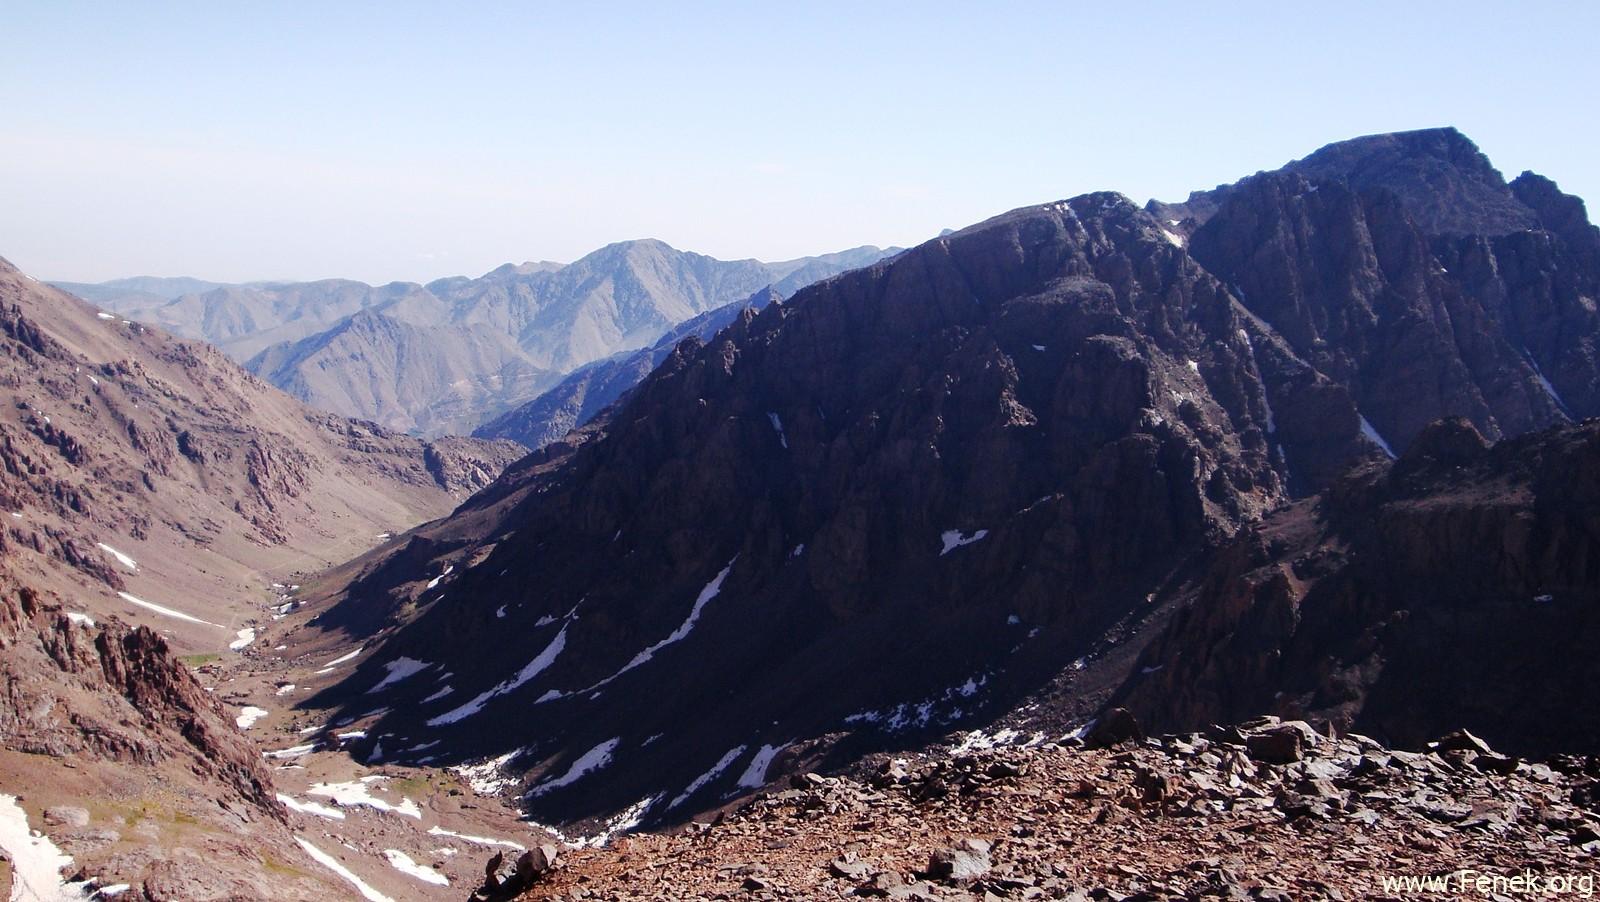 rechts der Djebel Toubkal - höchster Nordafrikaner